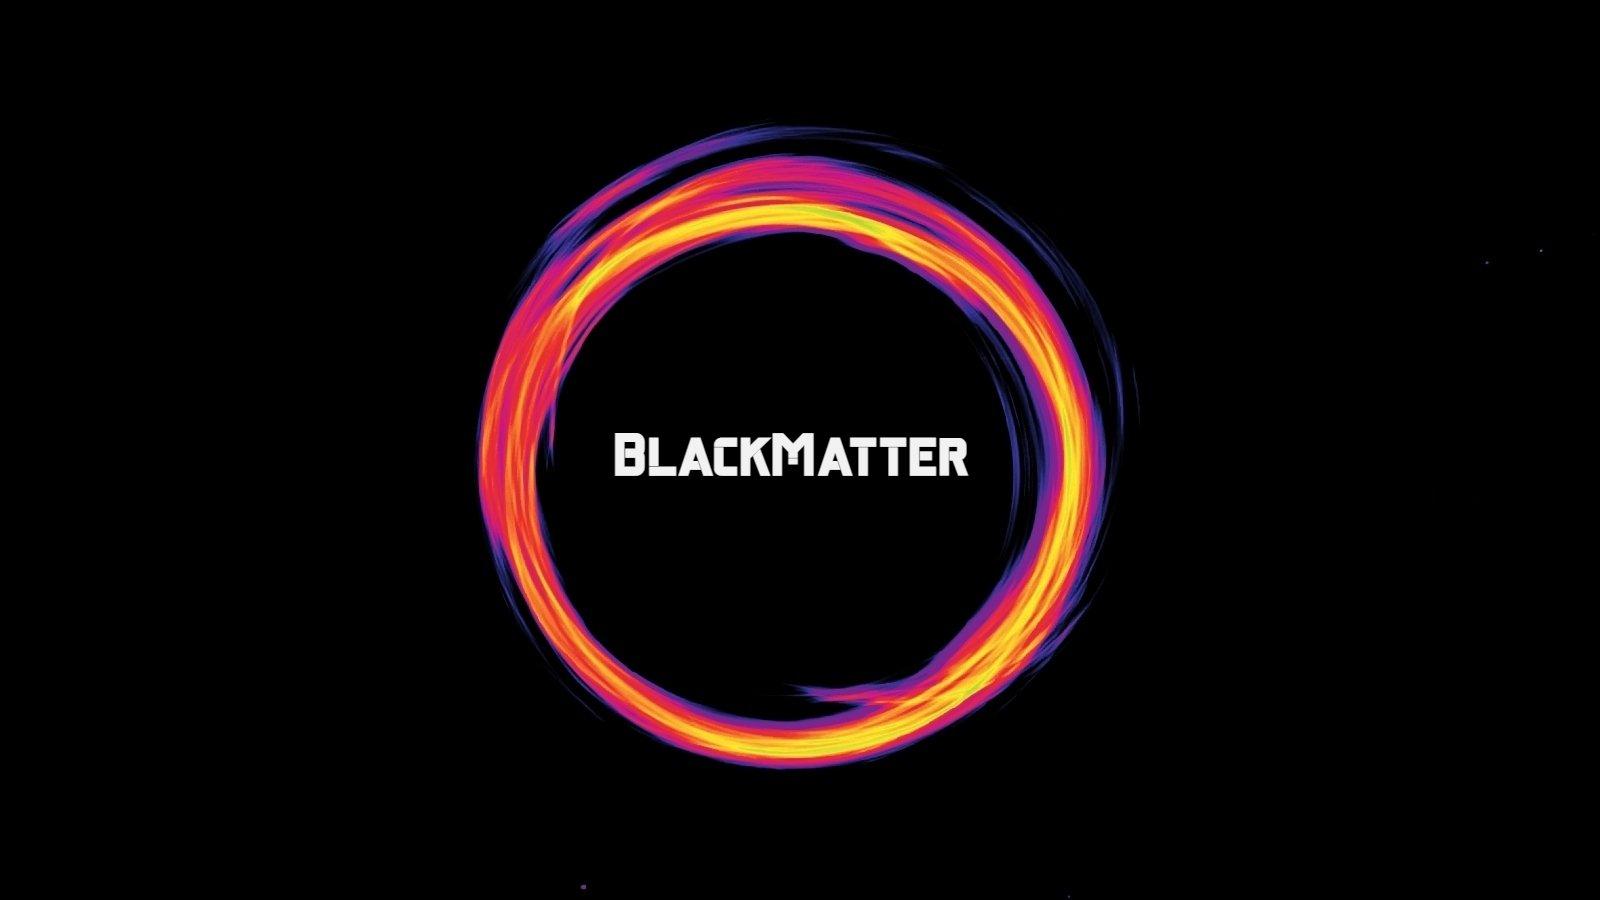 BlackMatter ransomware victims quietly helped using secret decryptors